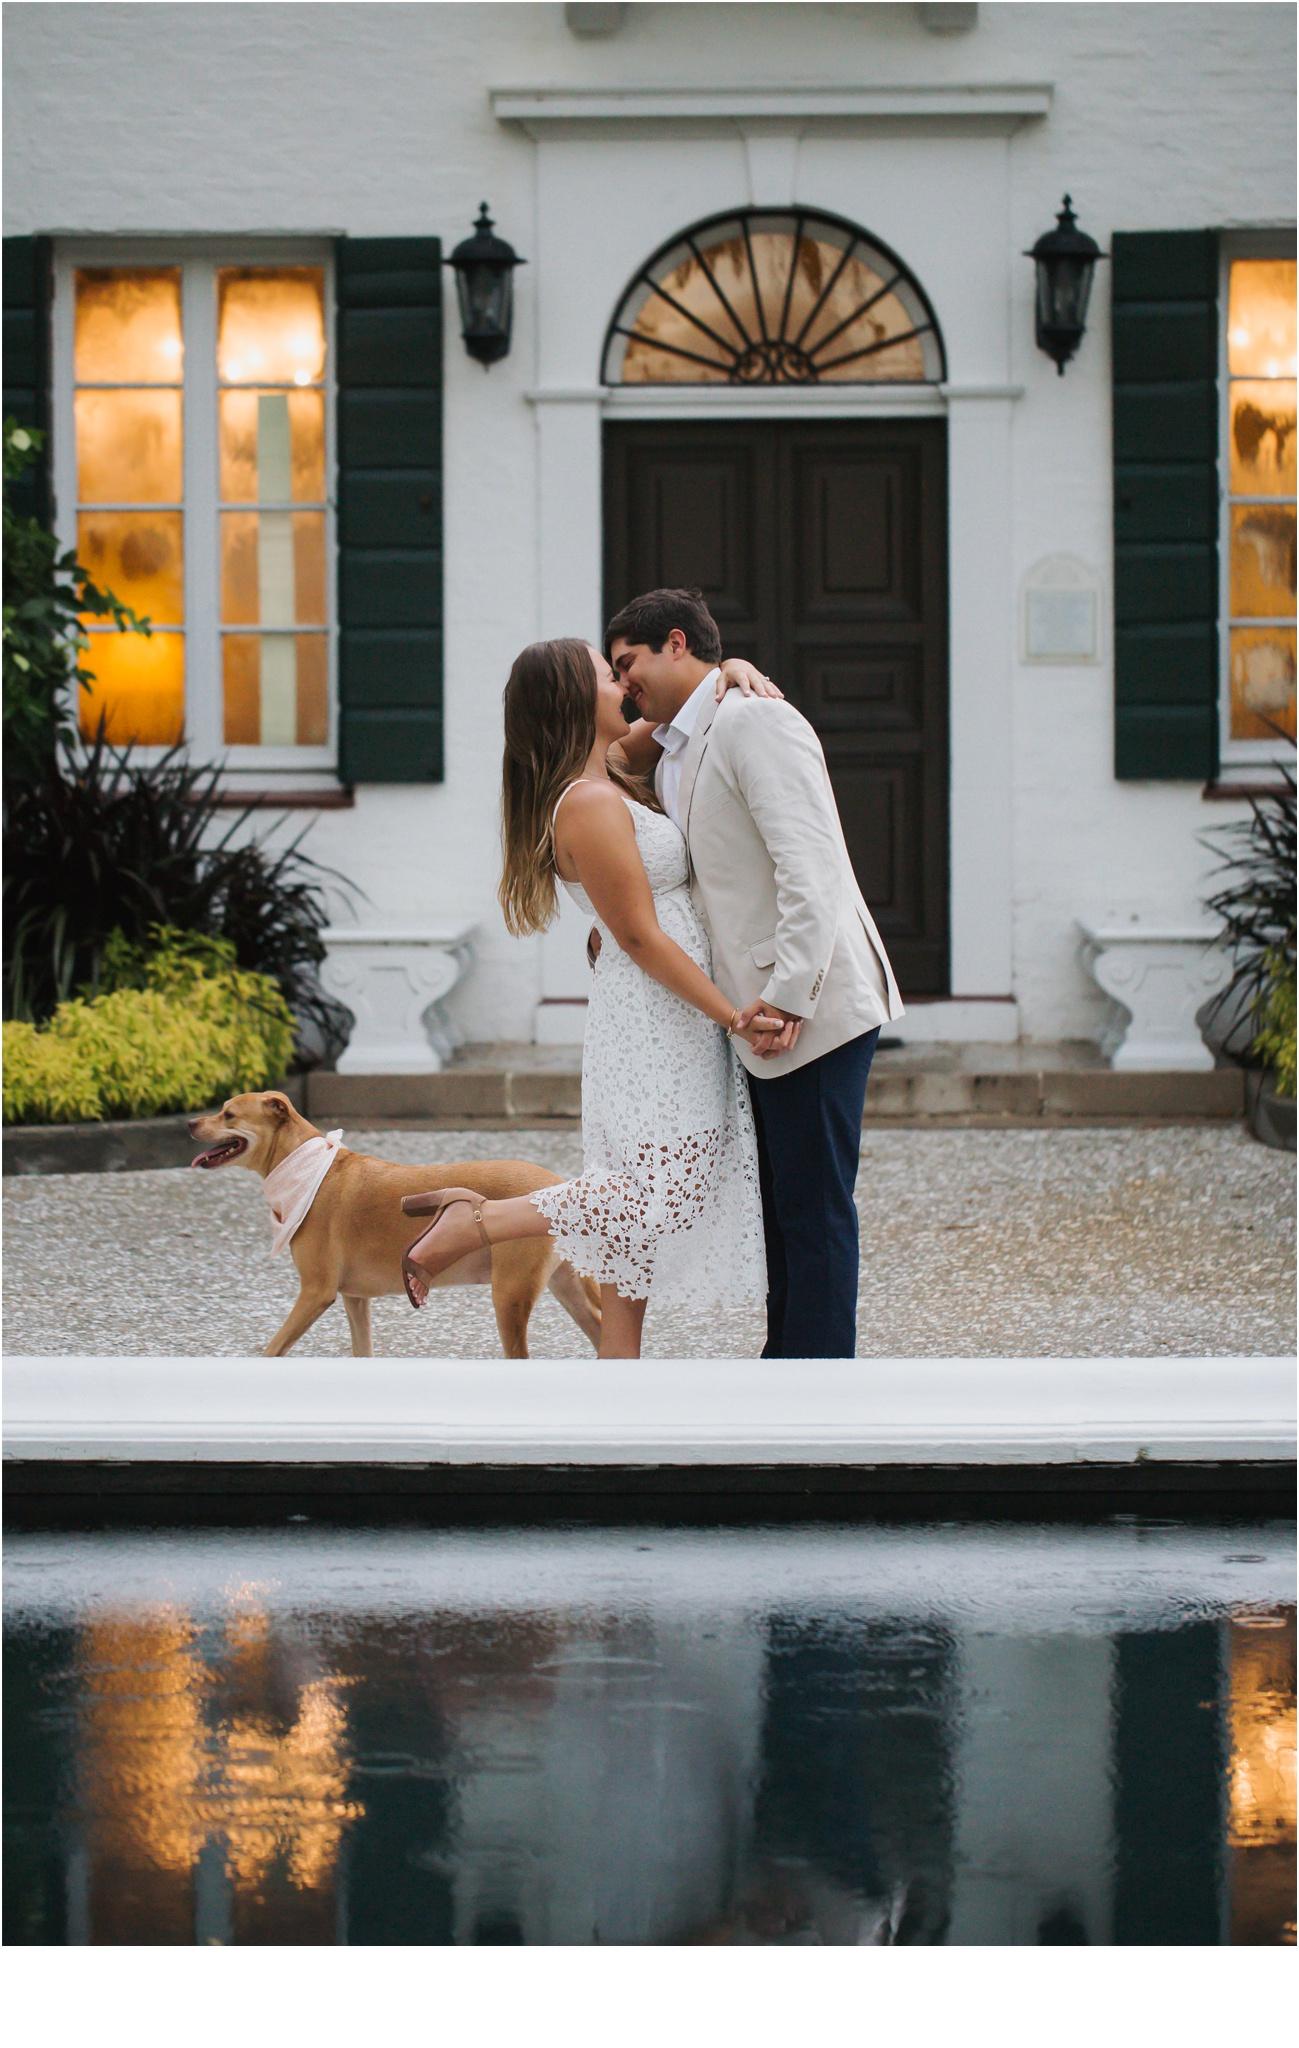 Rainey_Gregg_Photography_St._Simons_Island_Georgia_California_Wedding_Portrait_Photography_1133.jpg